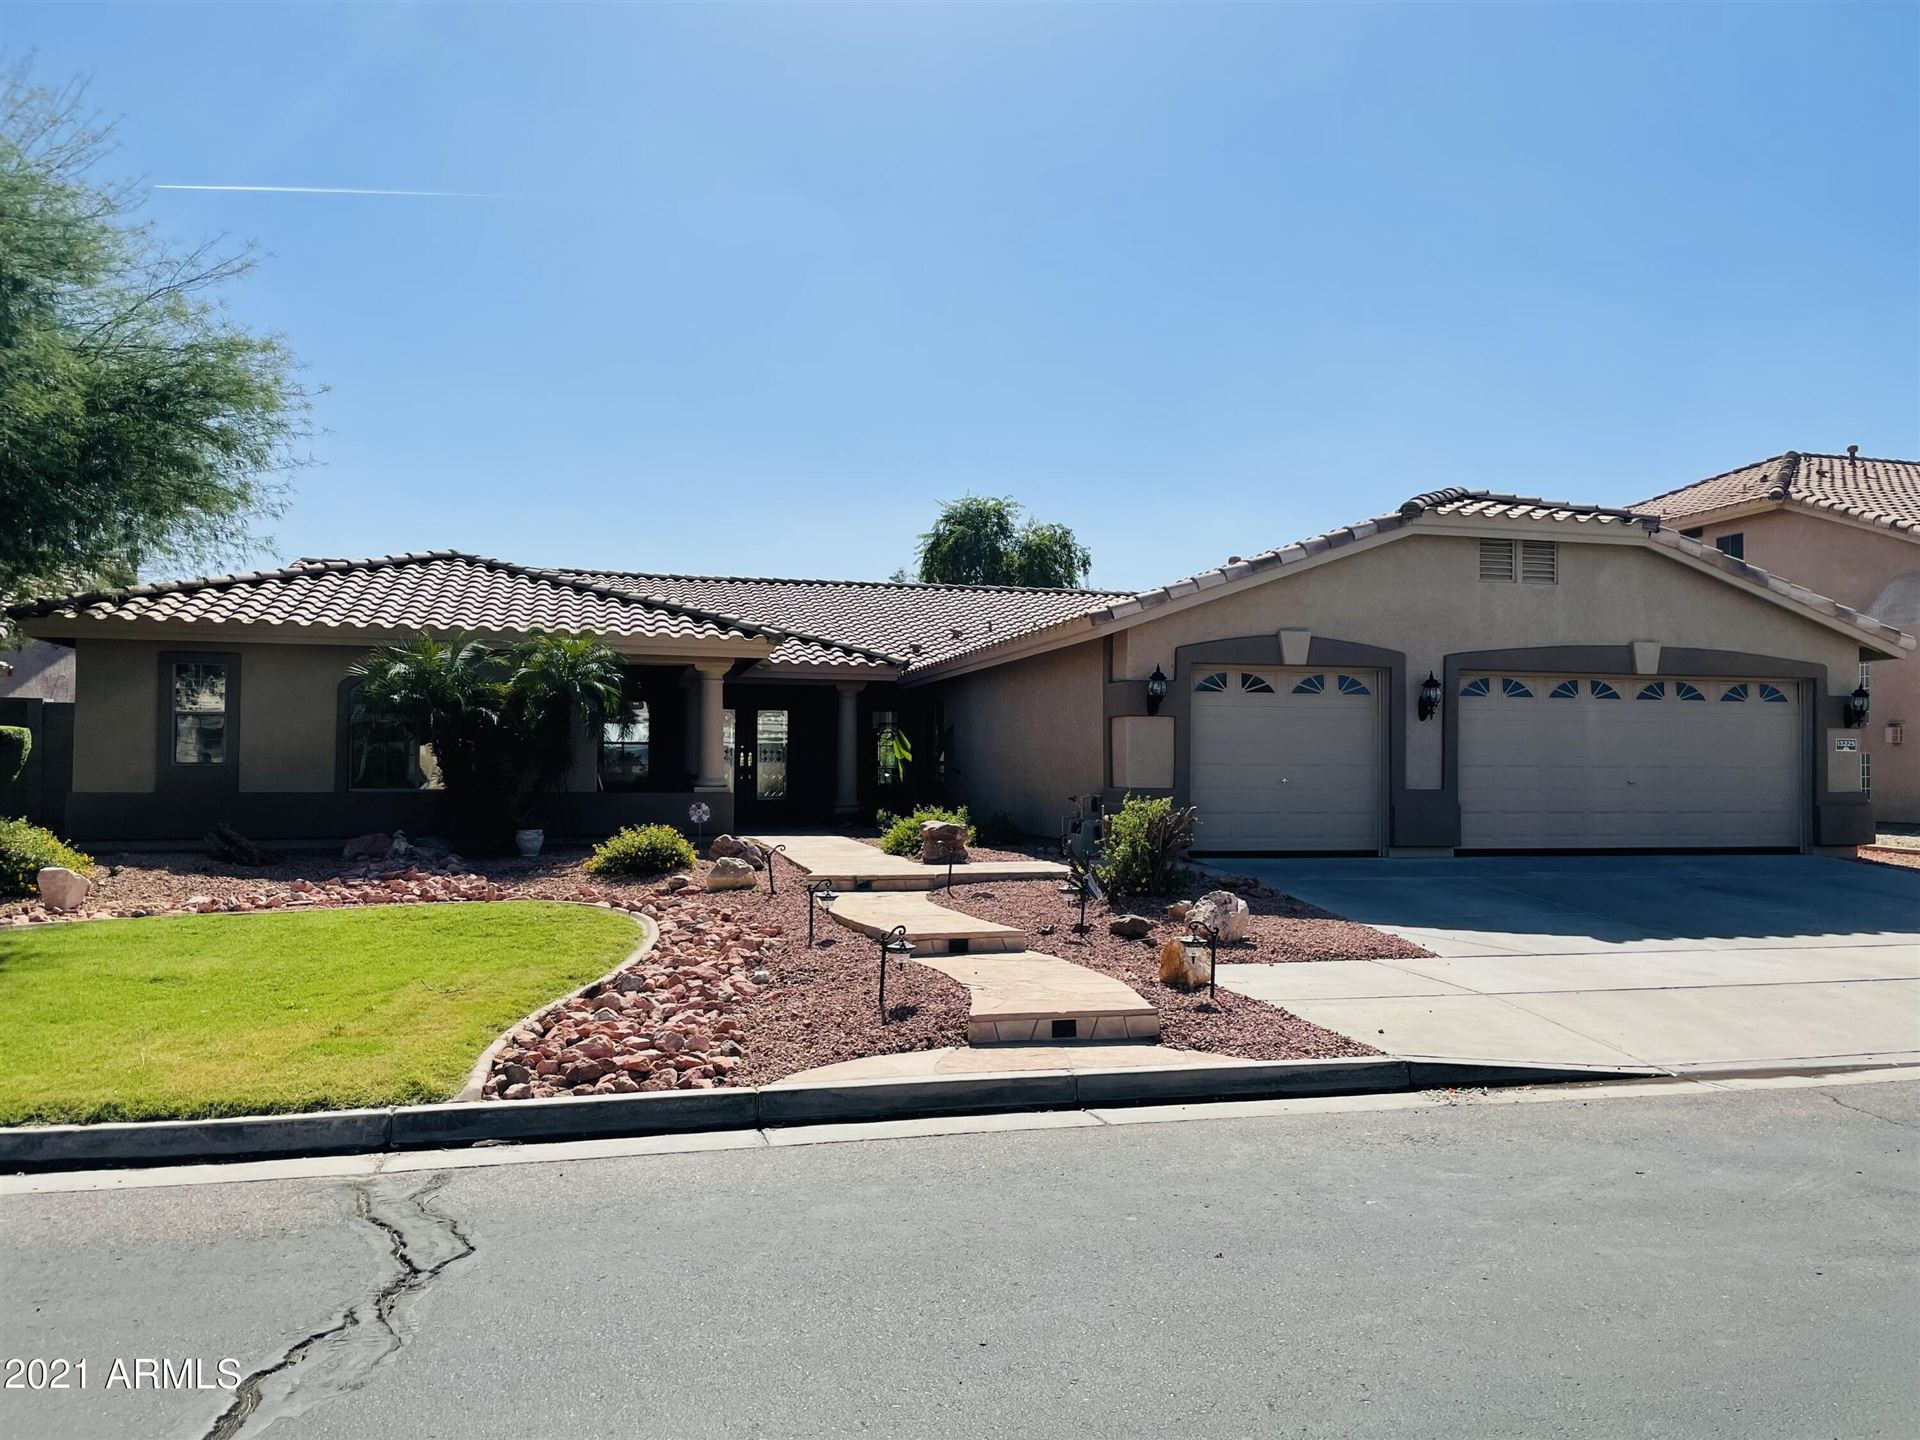 Photo of 13225 W COLTER Street, Litchfield Park, AZ 85340 (MLS # 6310025)